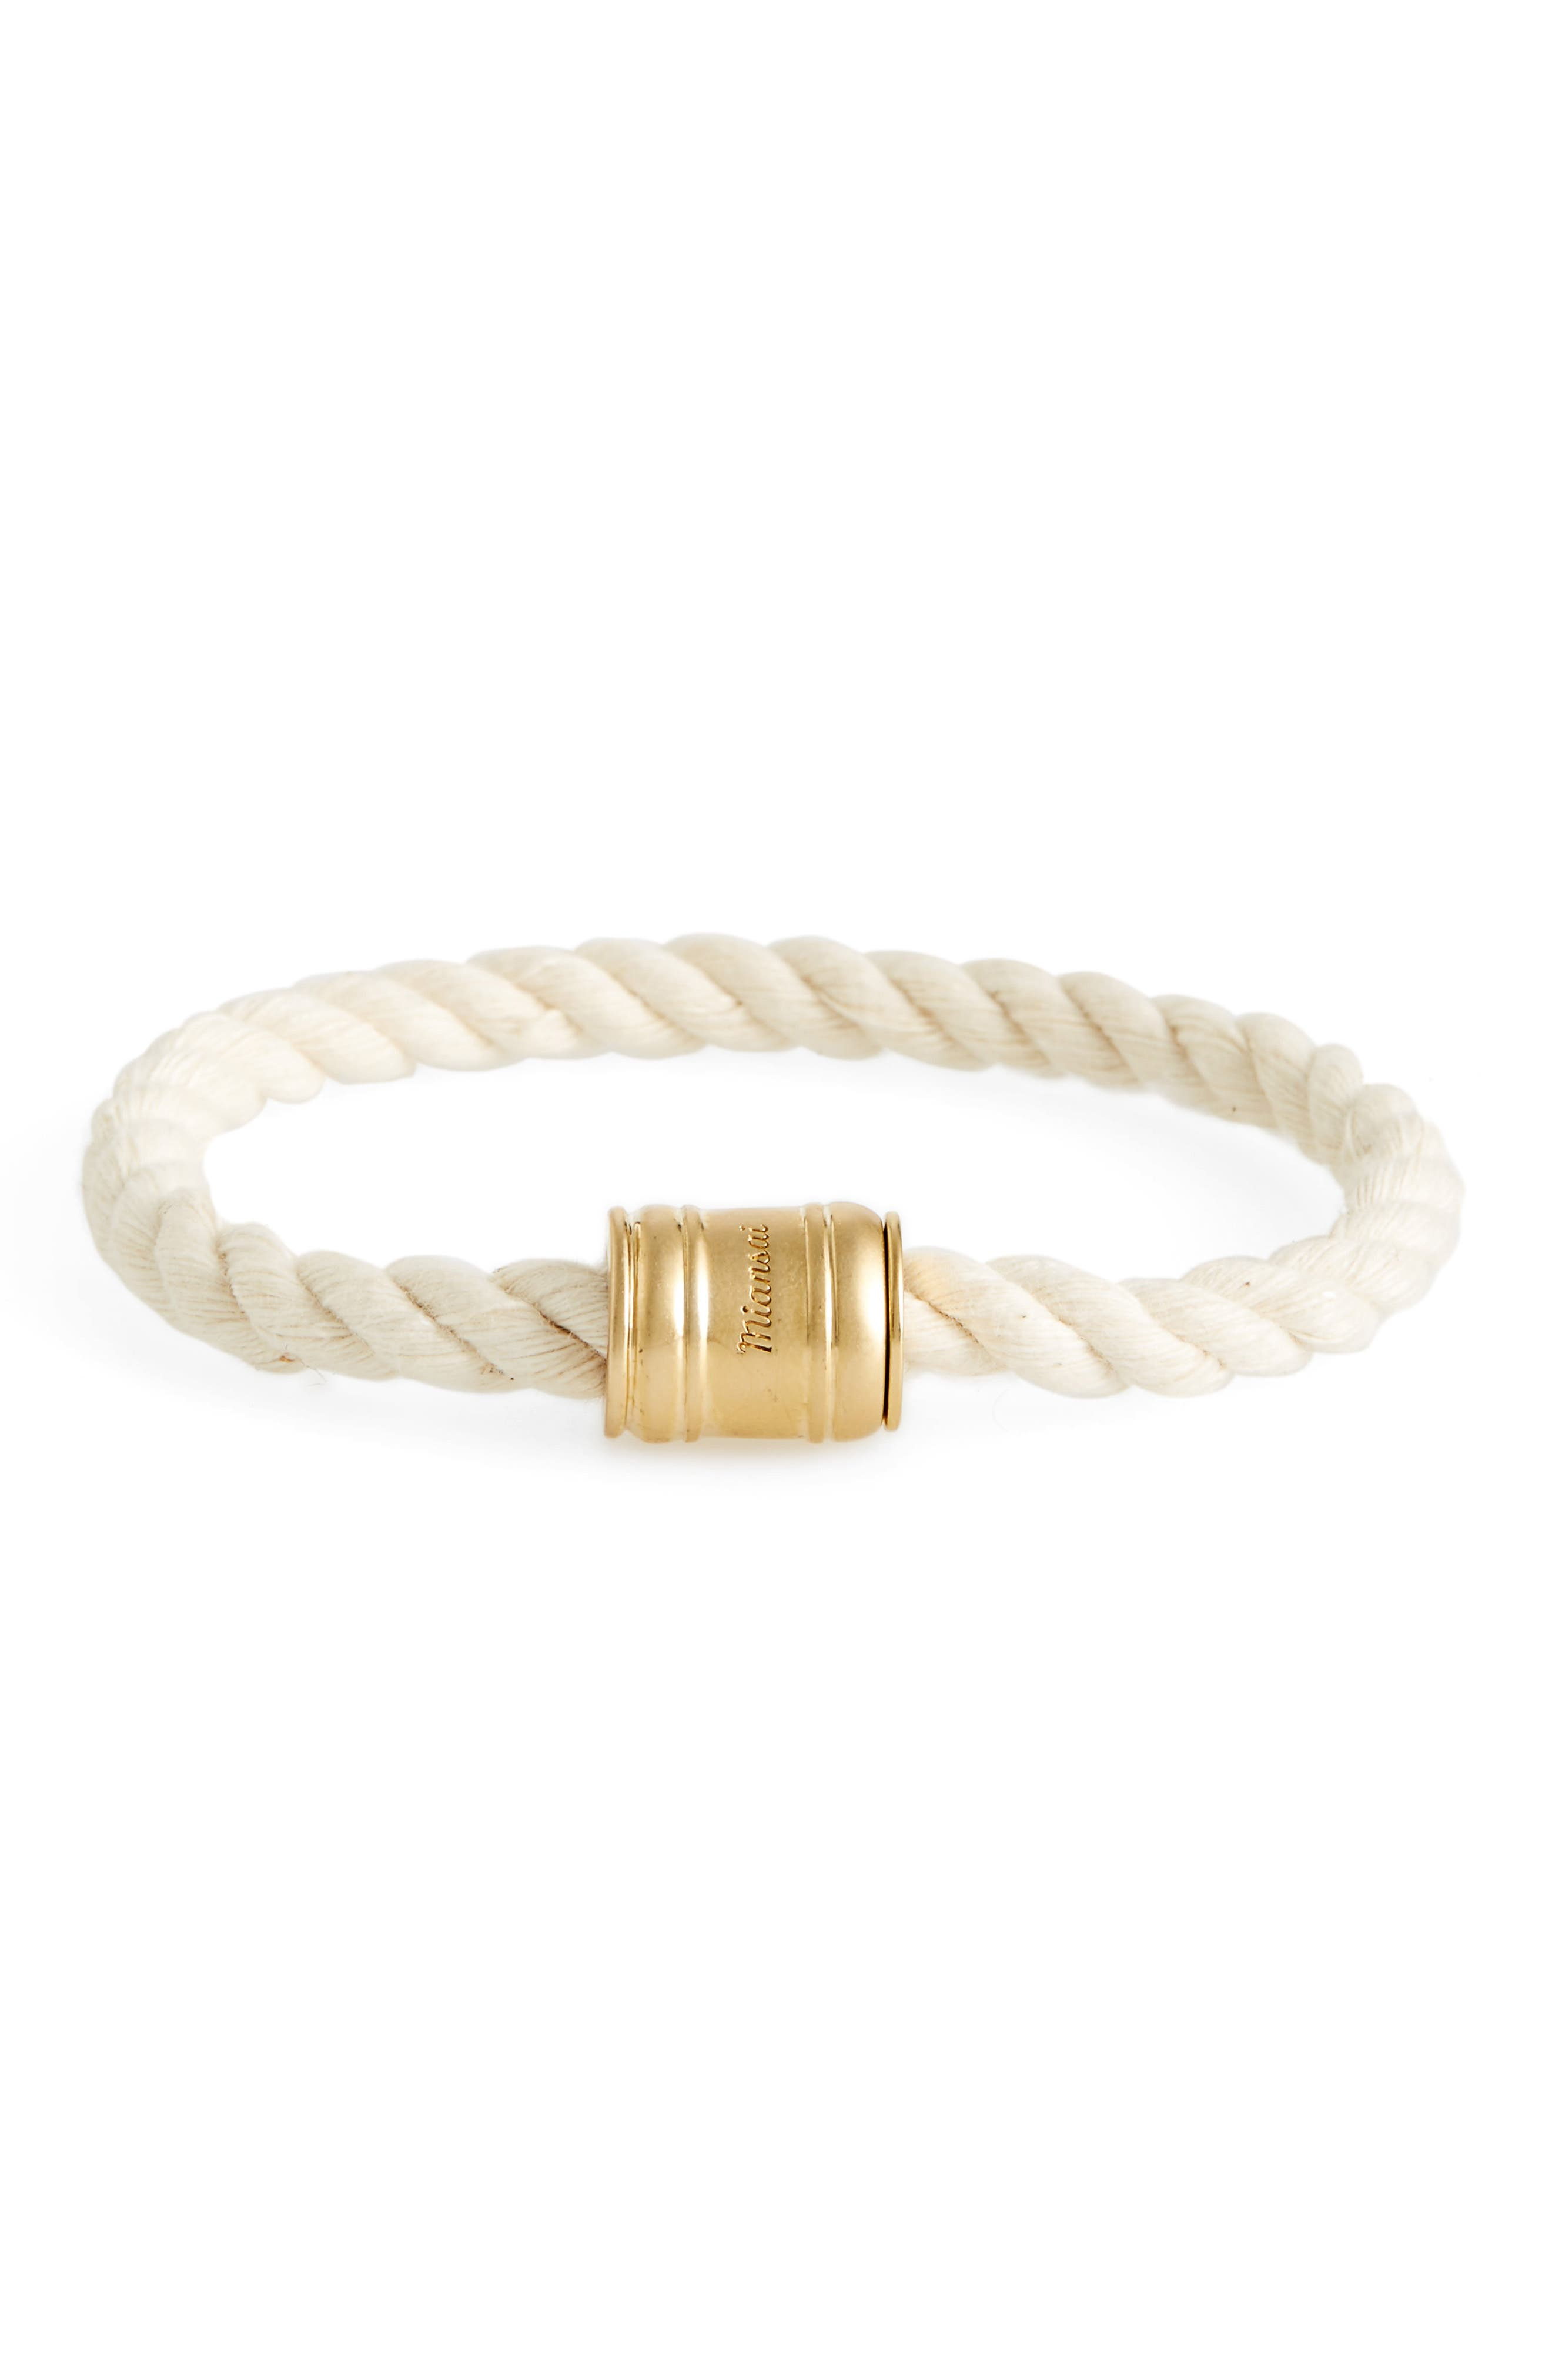 Miansai Barrel Casing Rope Bracelet